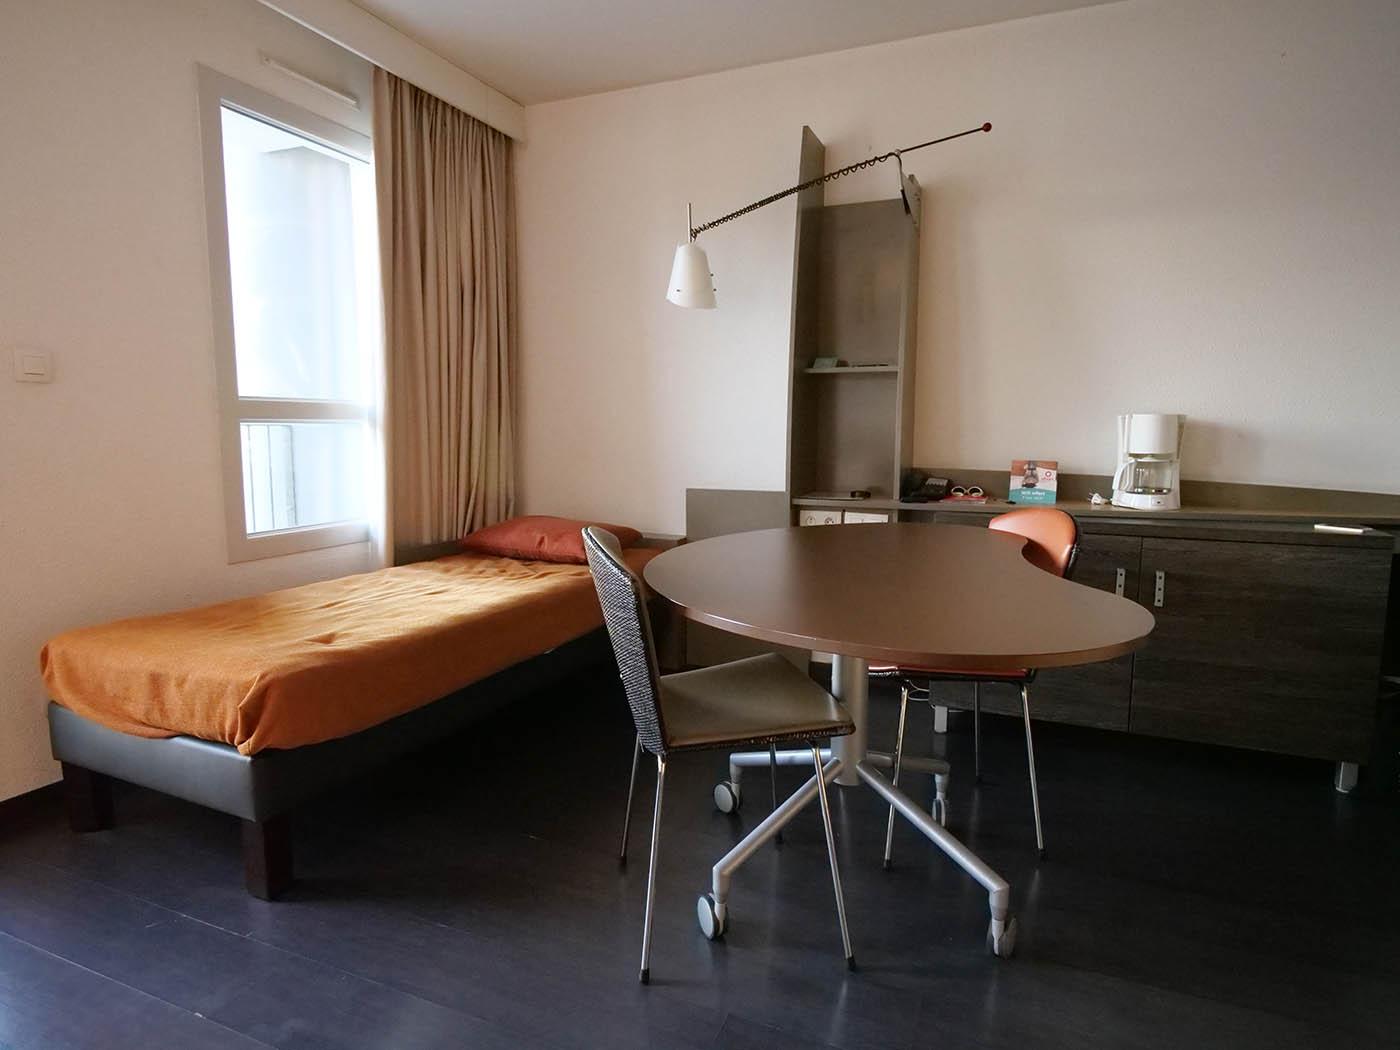 Appart Hotel Annecy coin salon